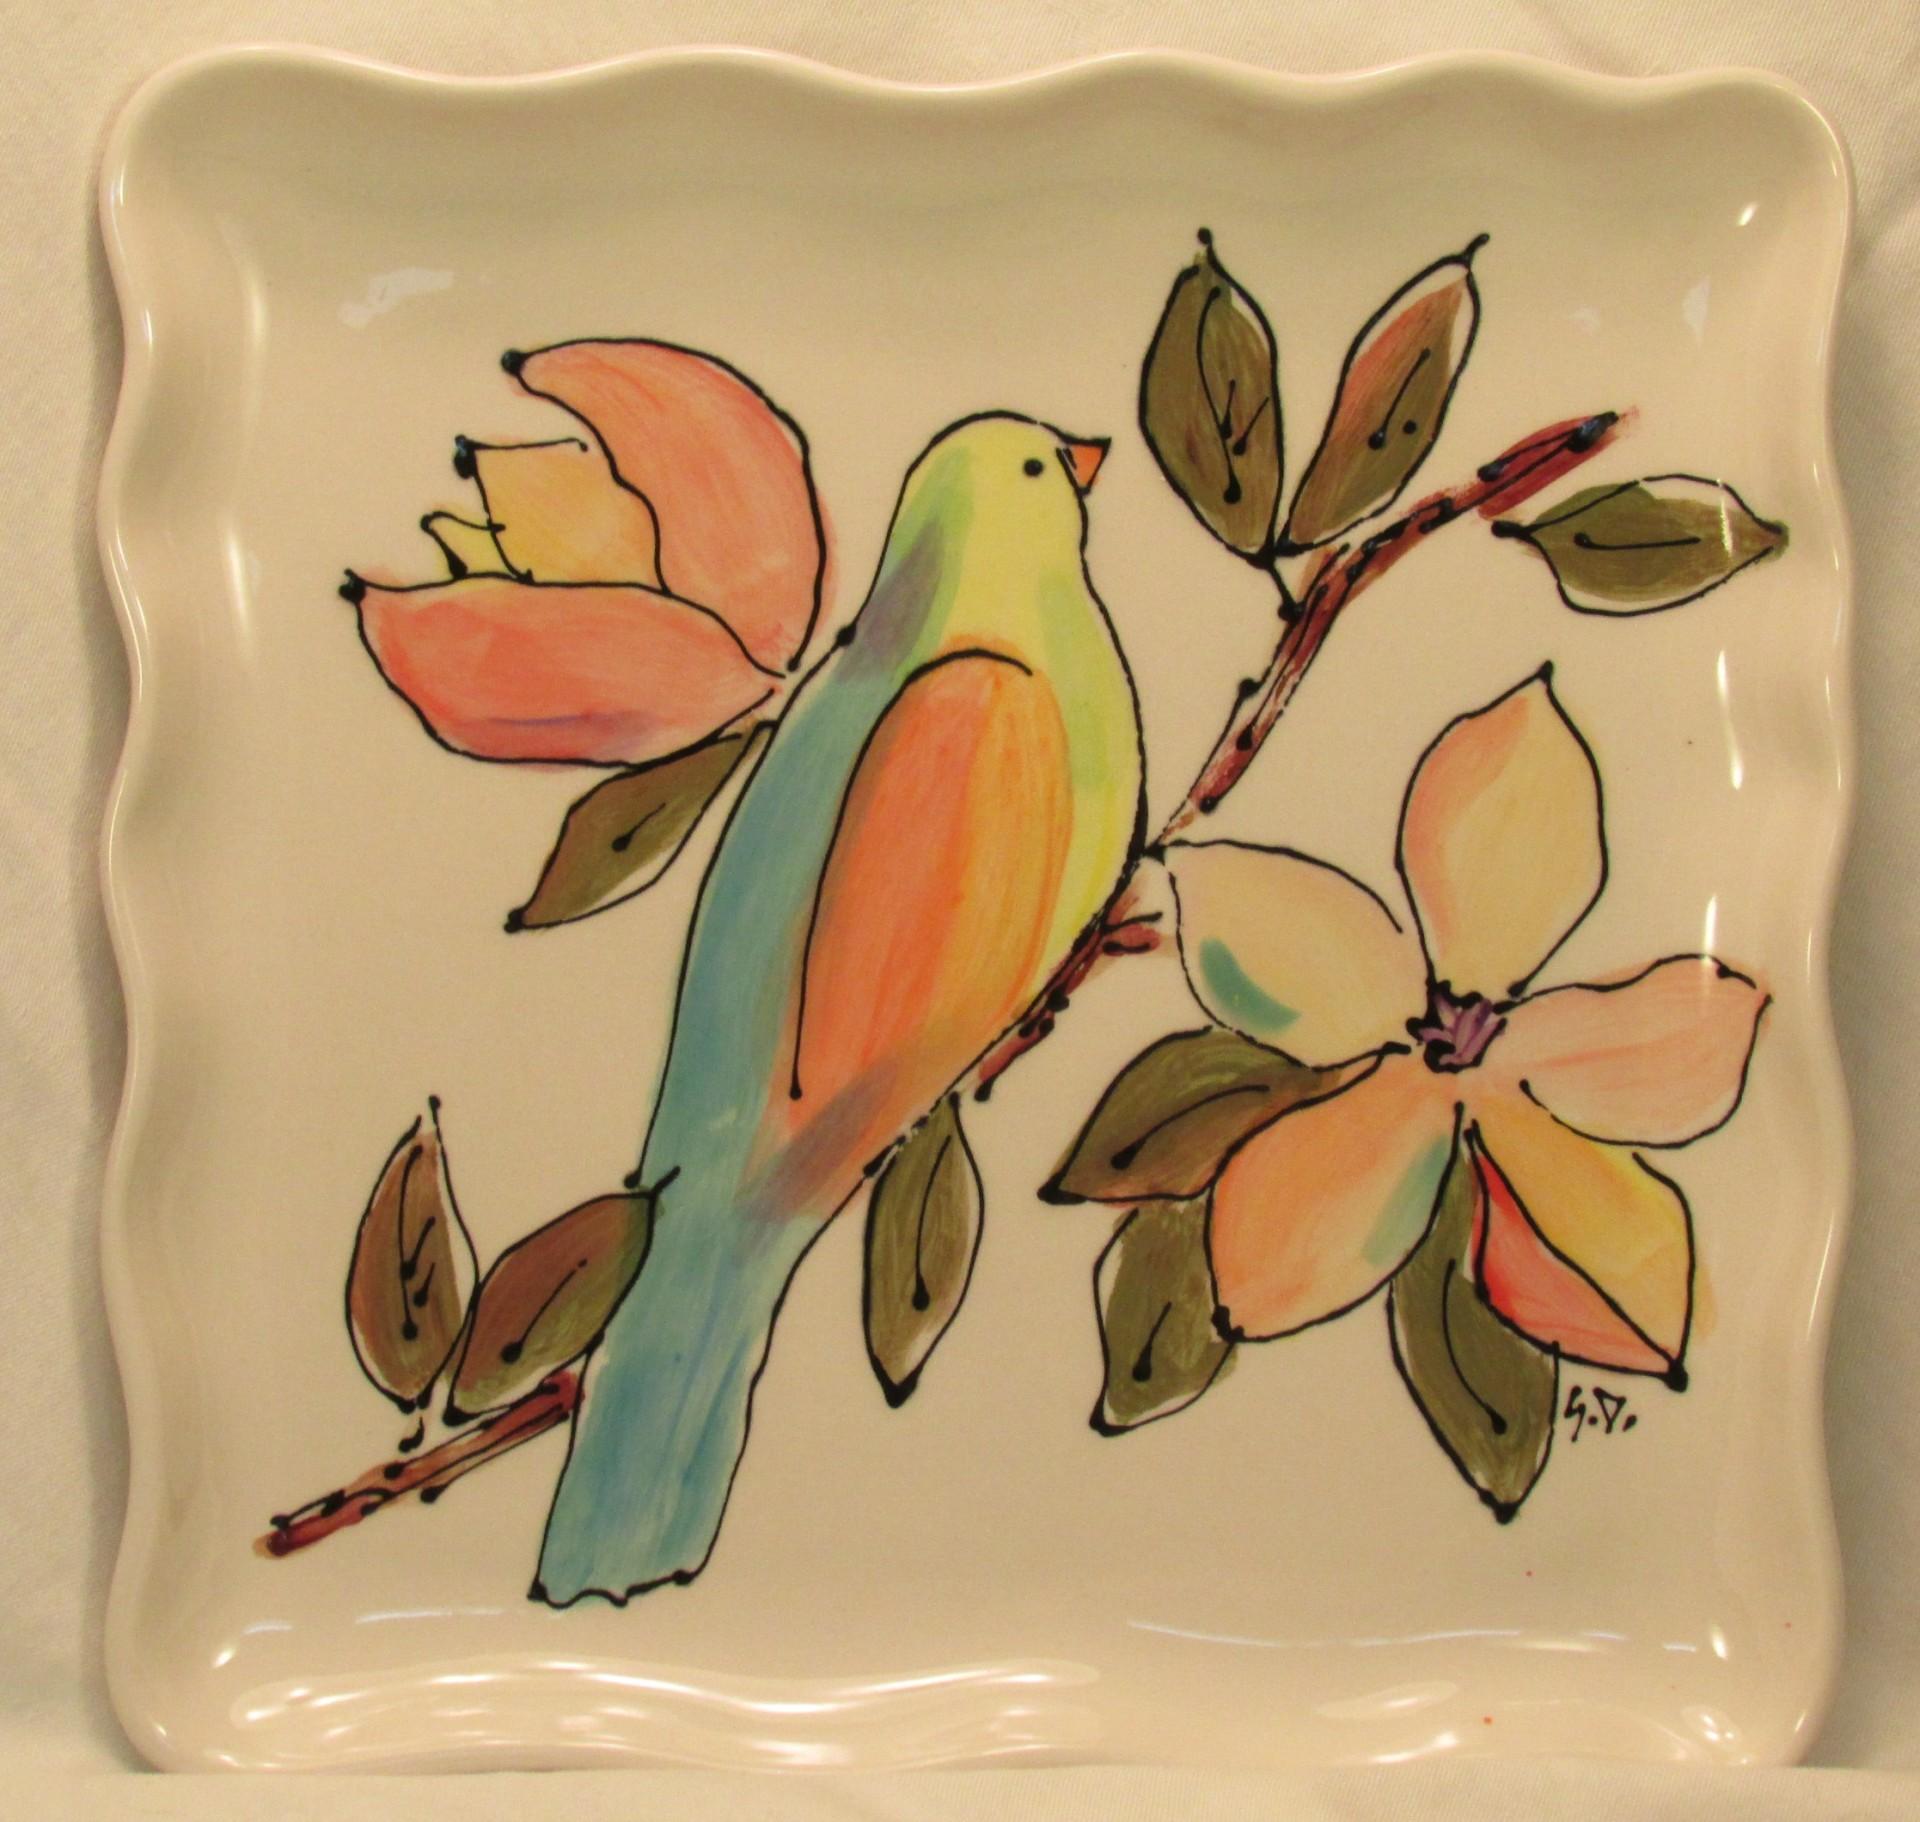 Birds & Magnolias Square Plate